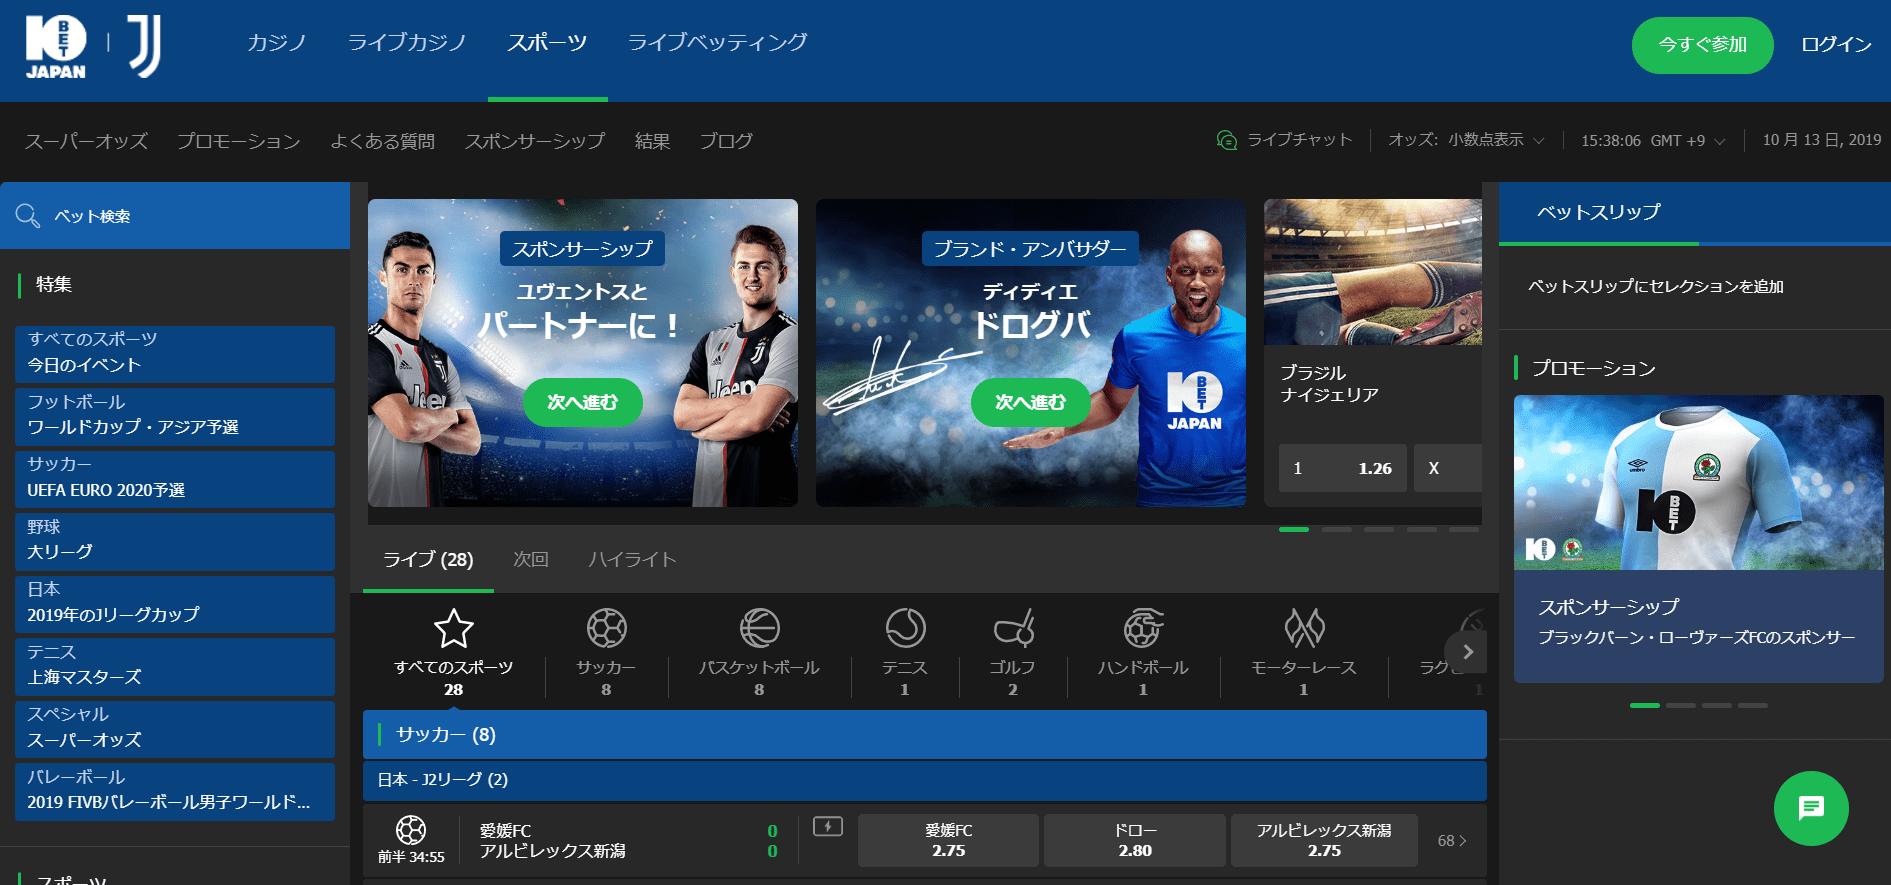 10Bet Japanのサイトトップ画面のスクリーンショット